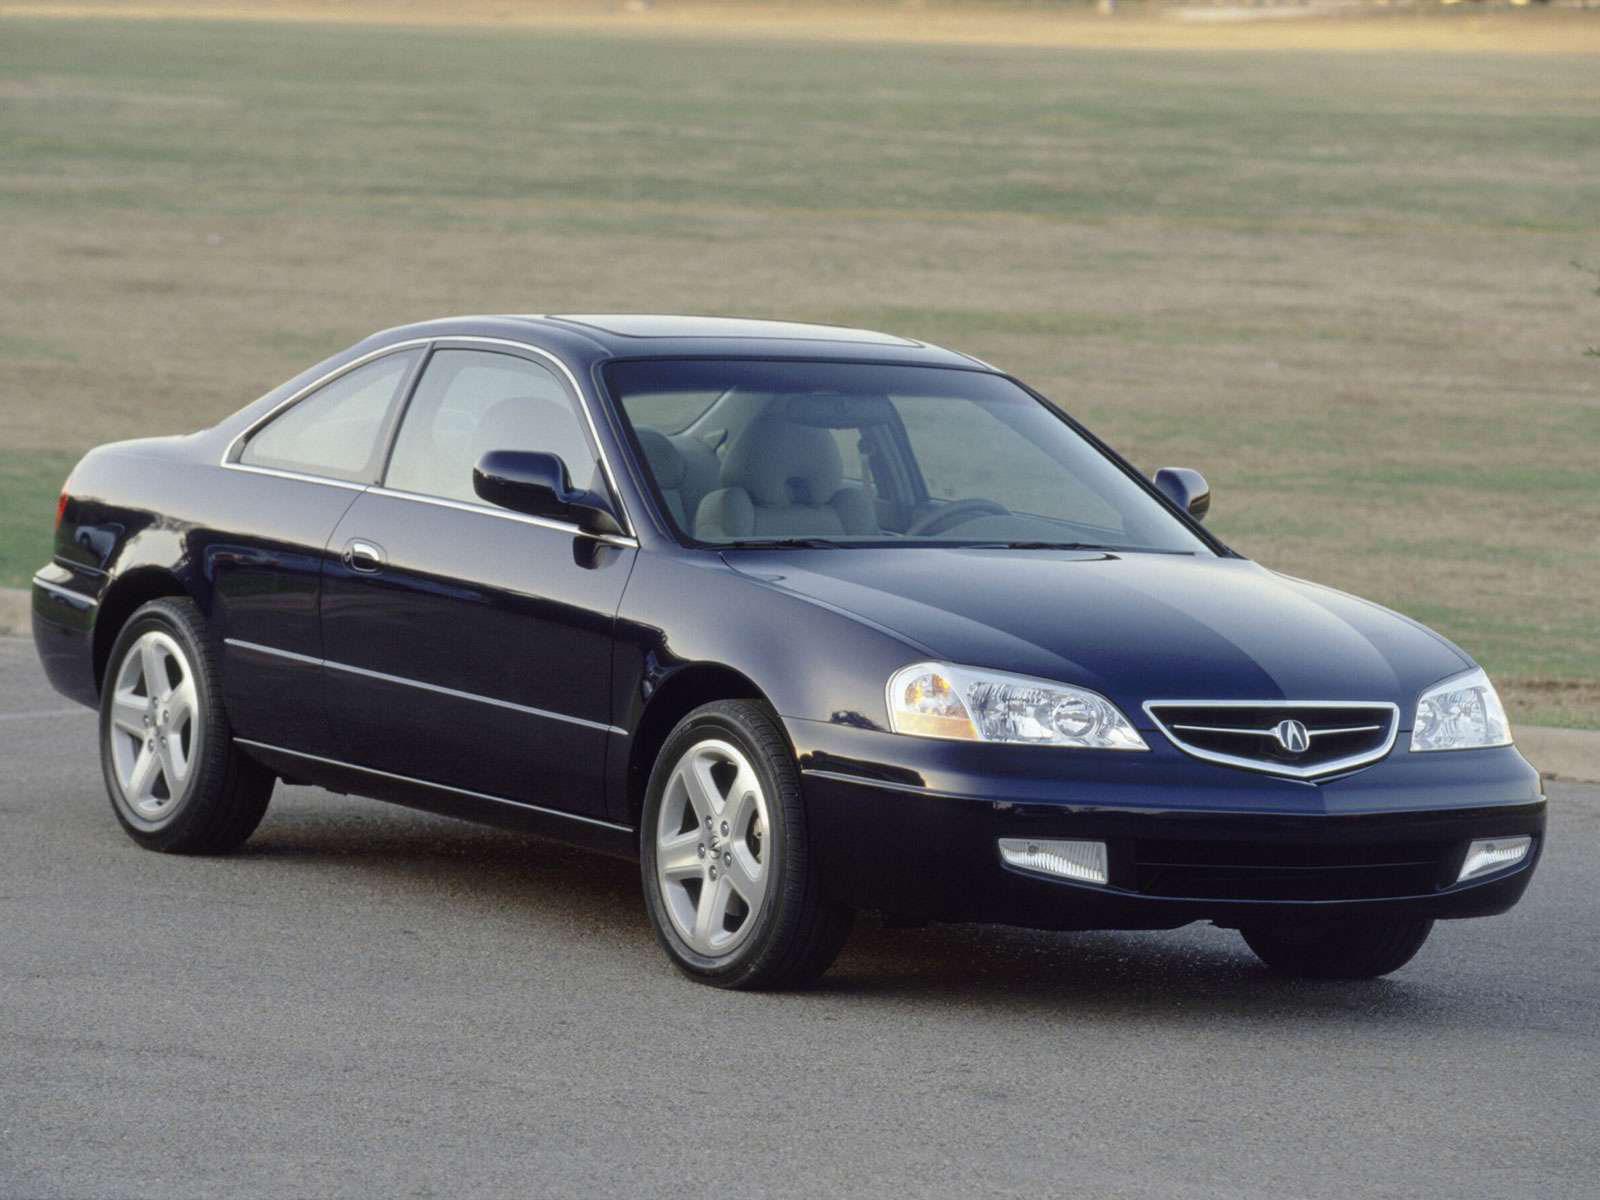 2001 Acura Tl 3 2 >> Car insurance, 2001 ACURA 3.2 CL Type-S desktop wallpaper ...